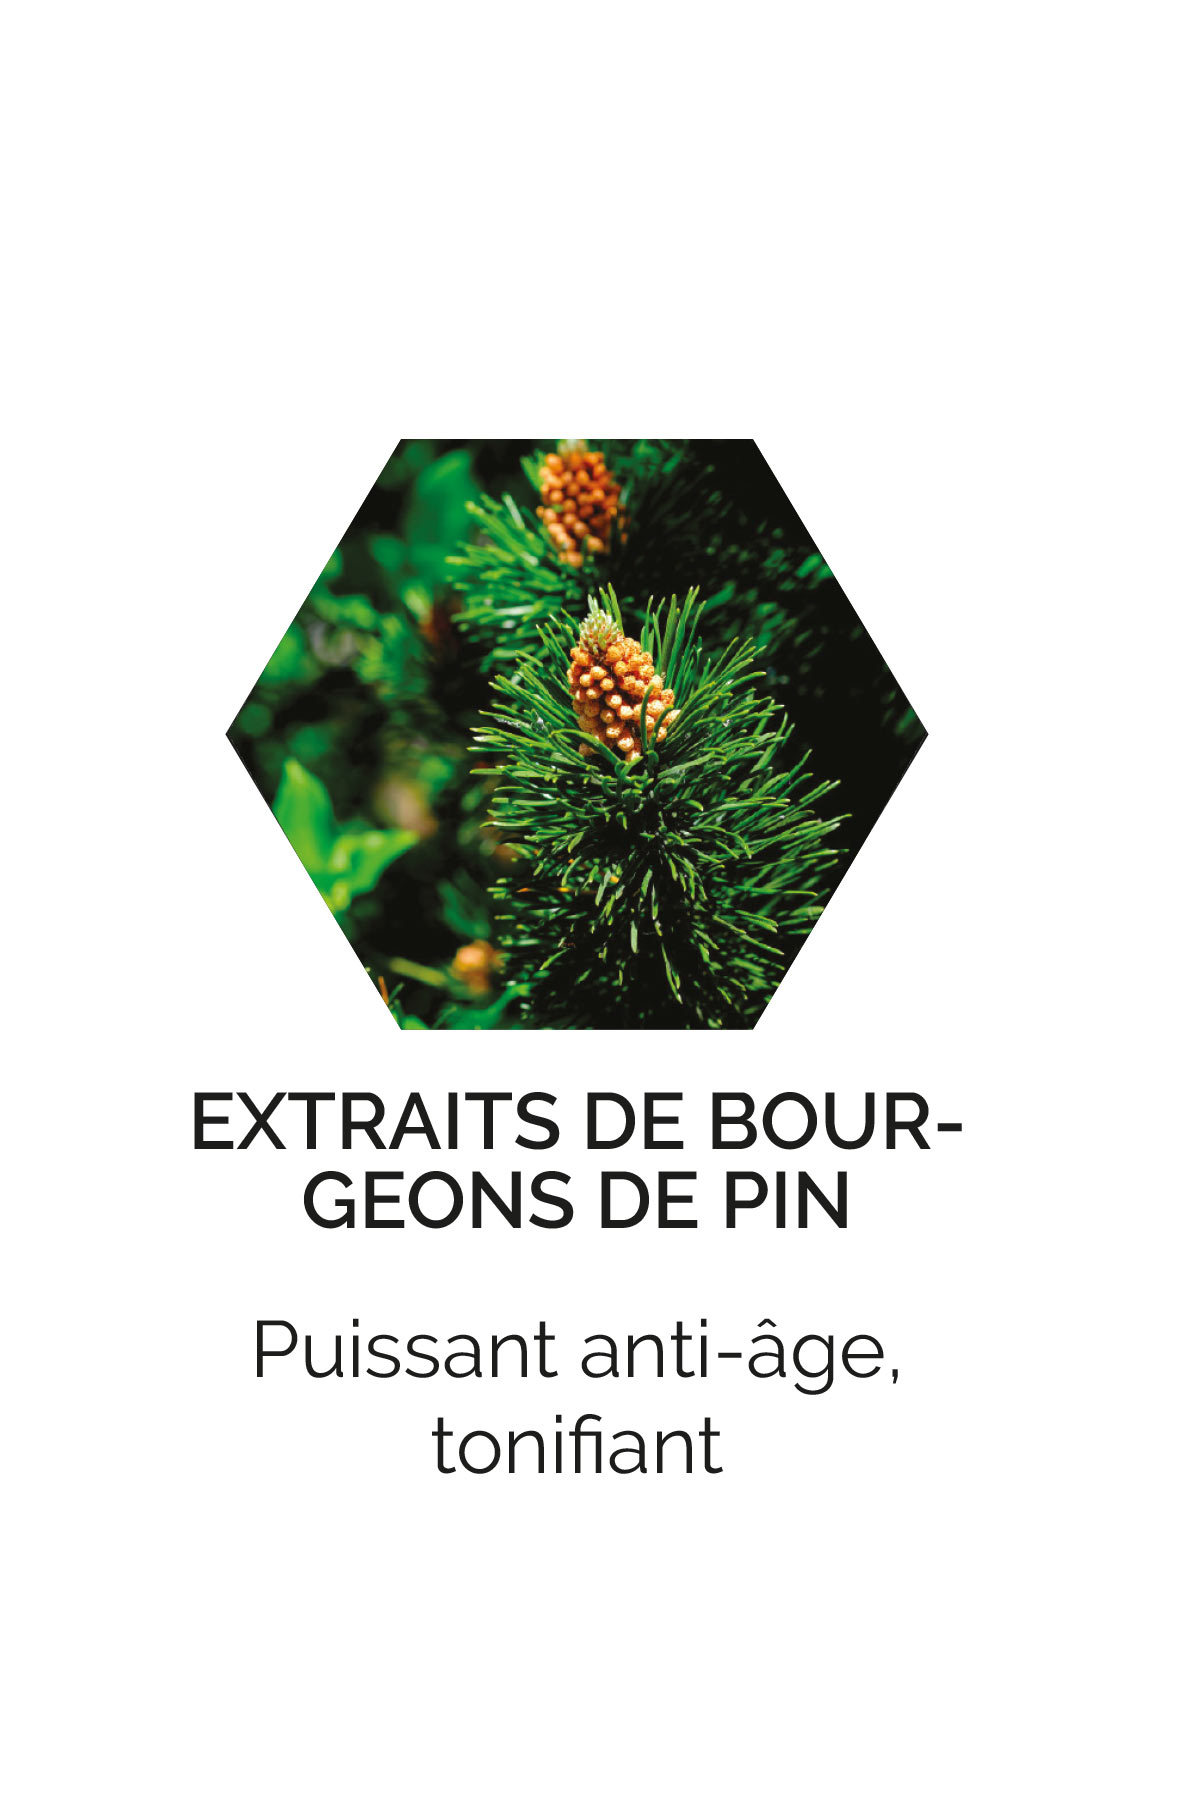 Extraits de bourgeons de pin